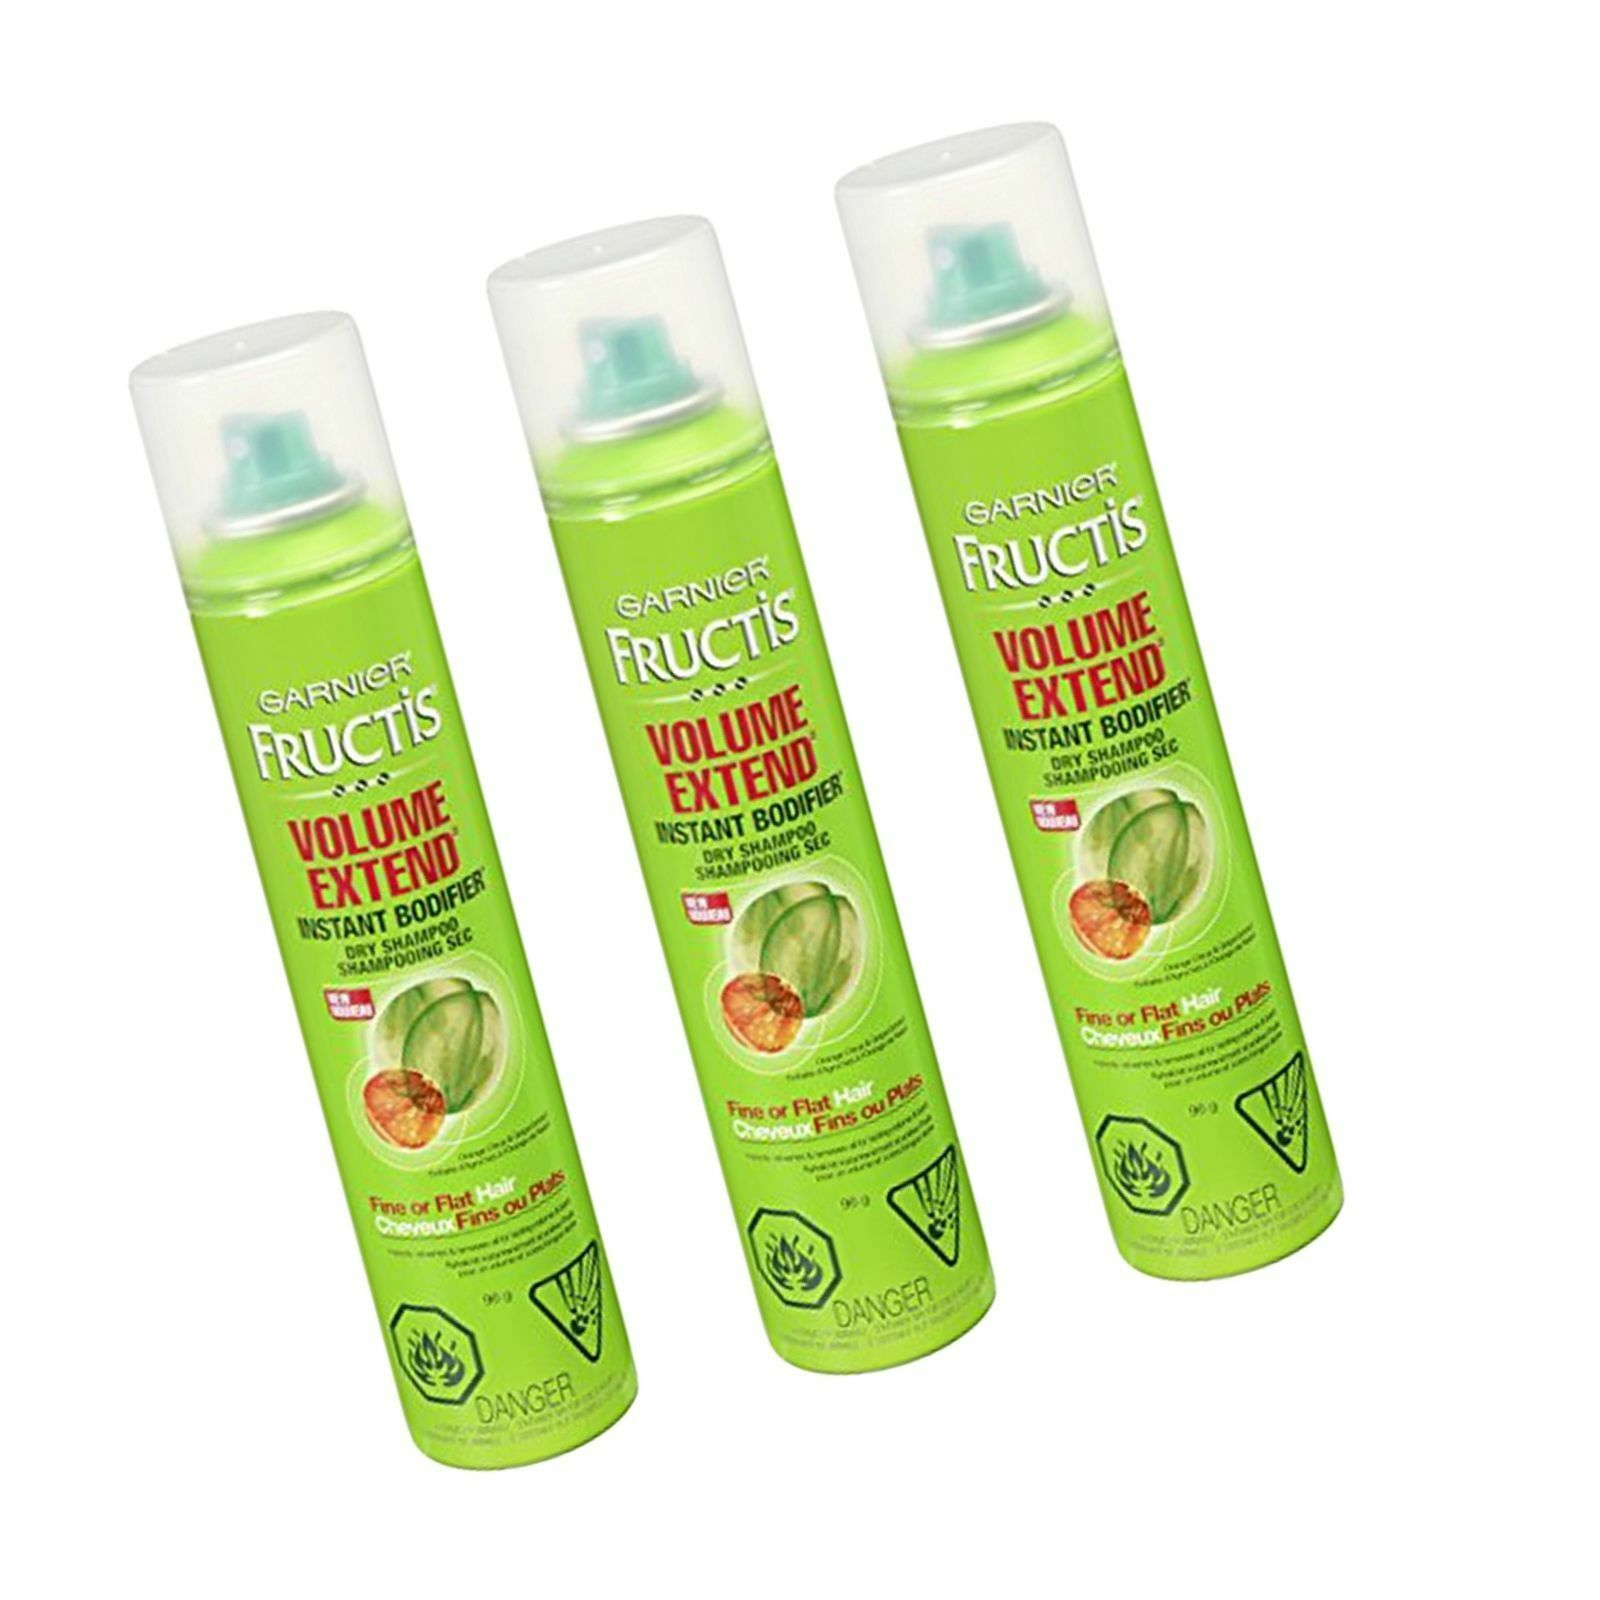 Garnier Fructis Volume Extend Instant Bodifier Dry Shampoo f